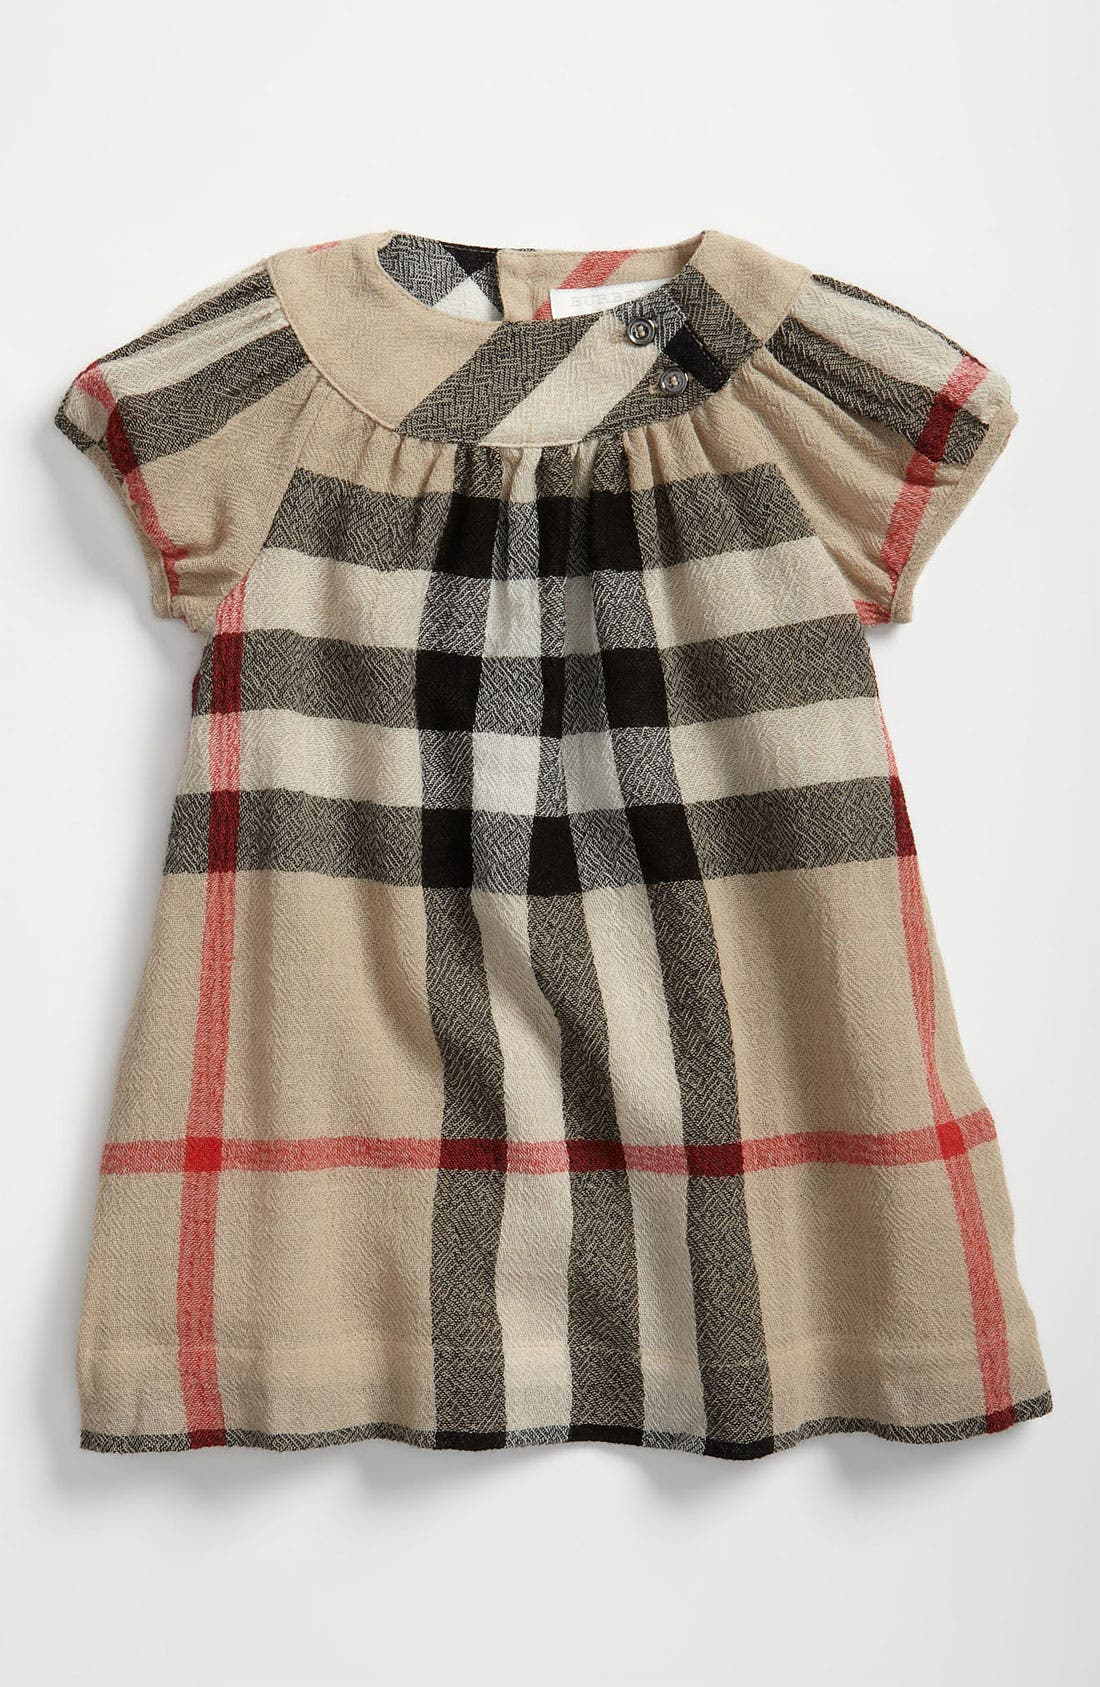 Alternate Image 1 Selected - Burberry Check Print Dress (Infant)